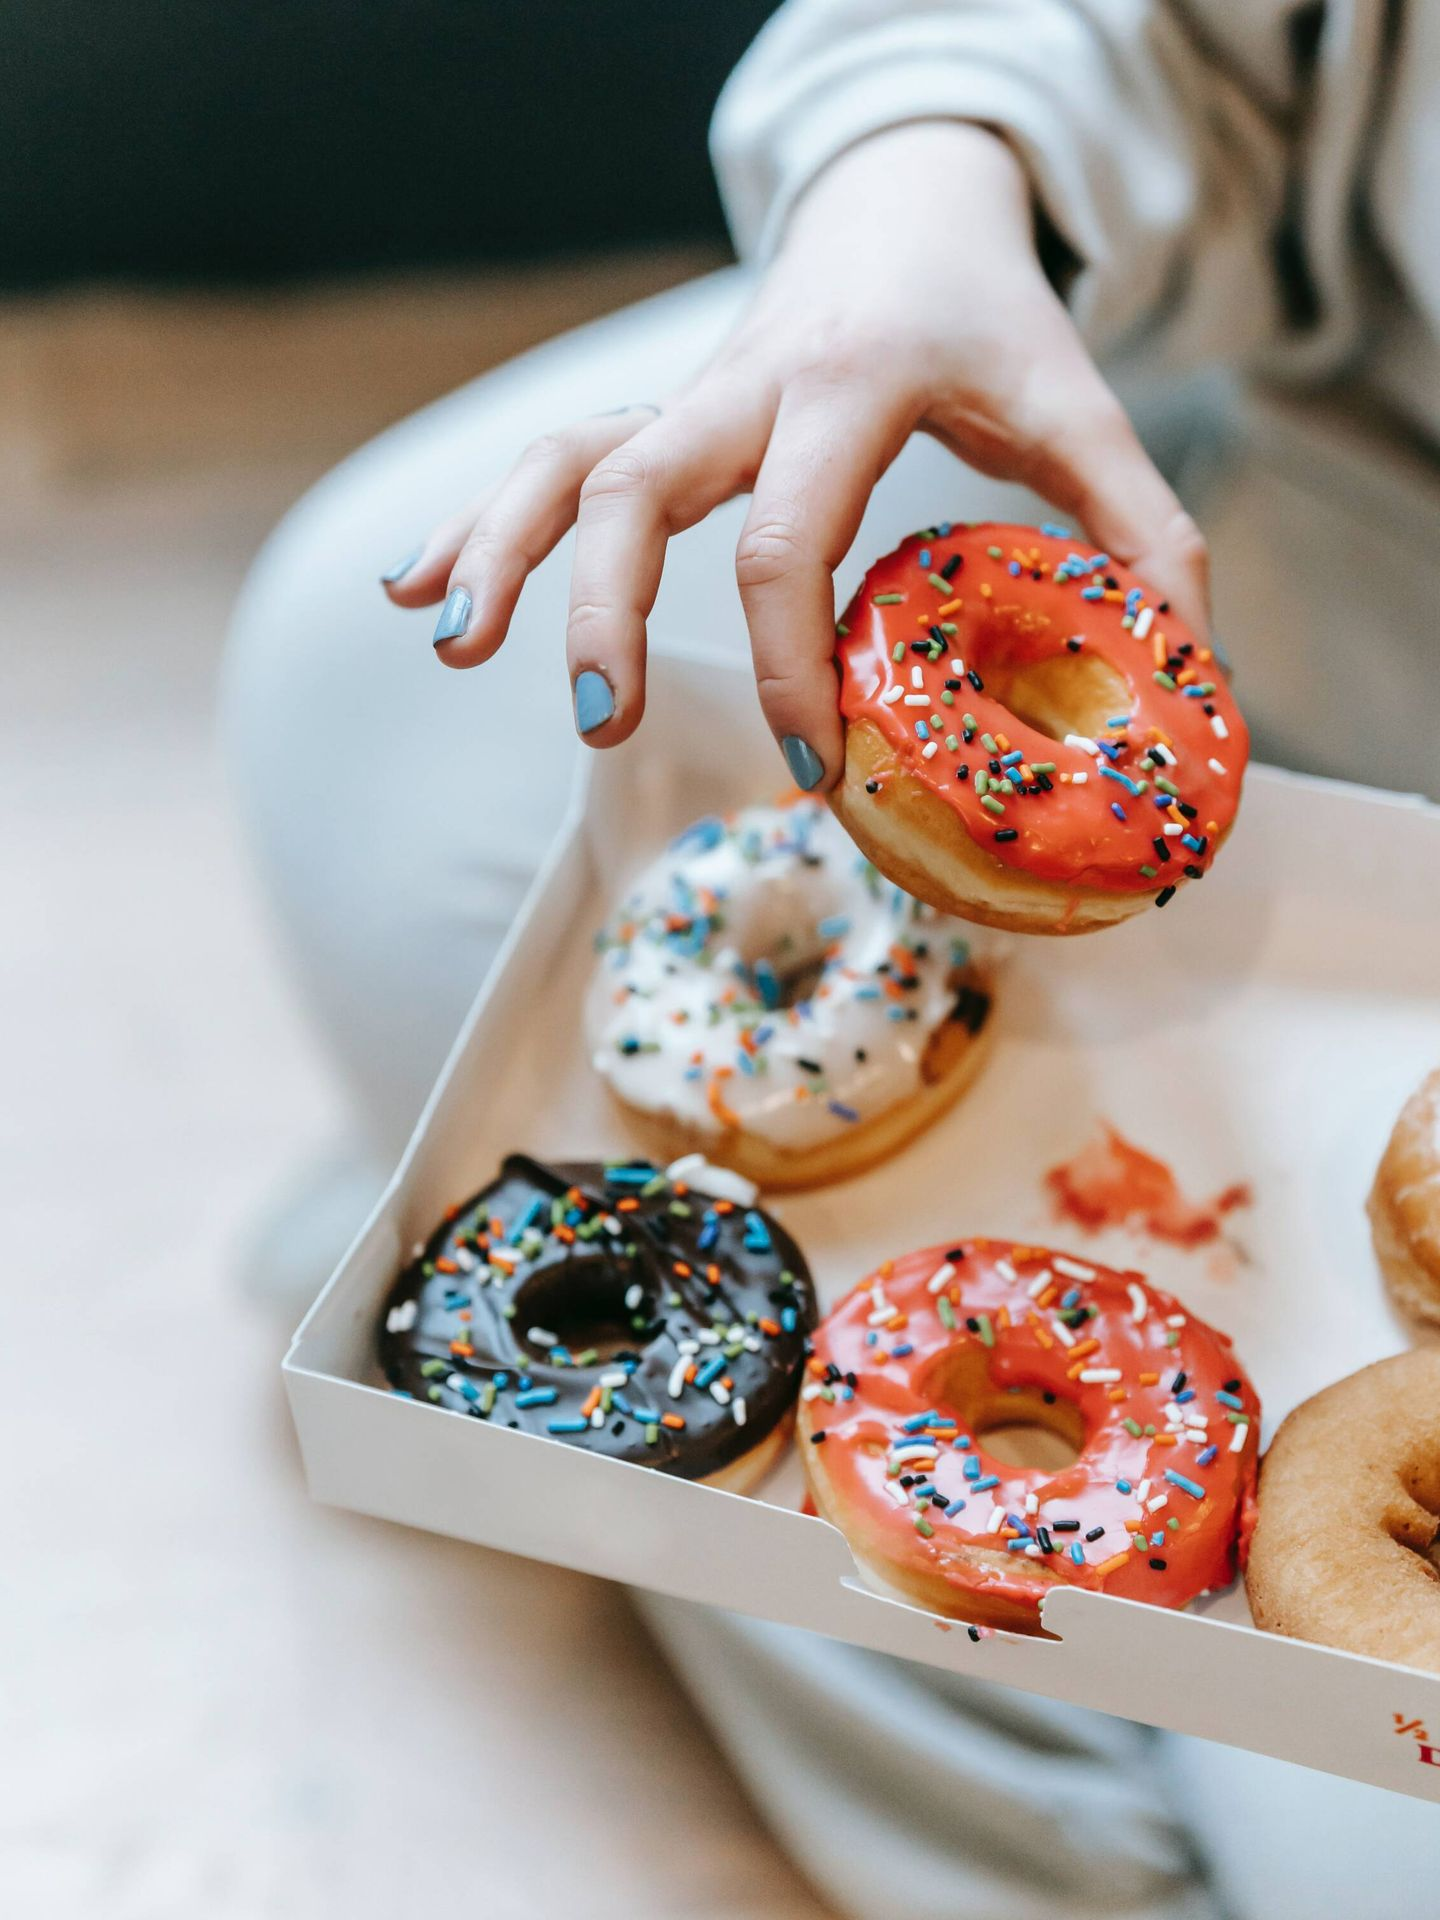 Dieta cardiosaludable para mejorar tu salud. (Andres Ayrton para Pexels)